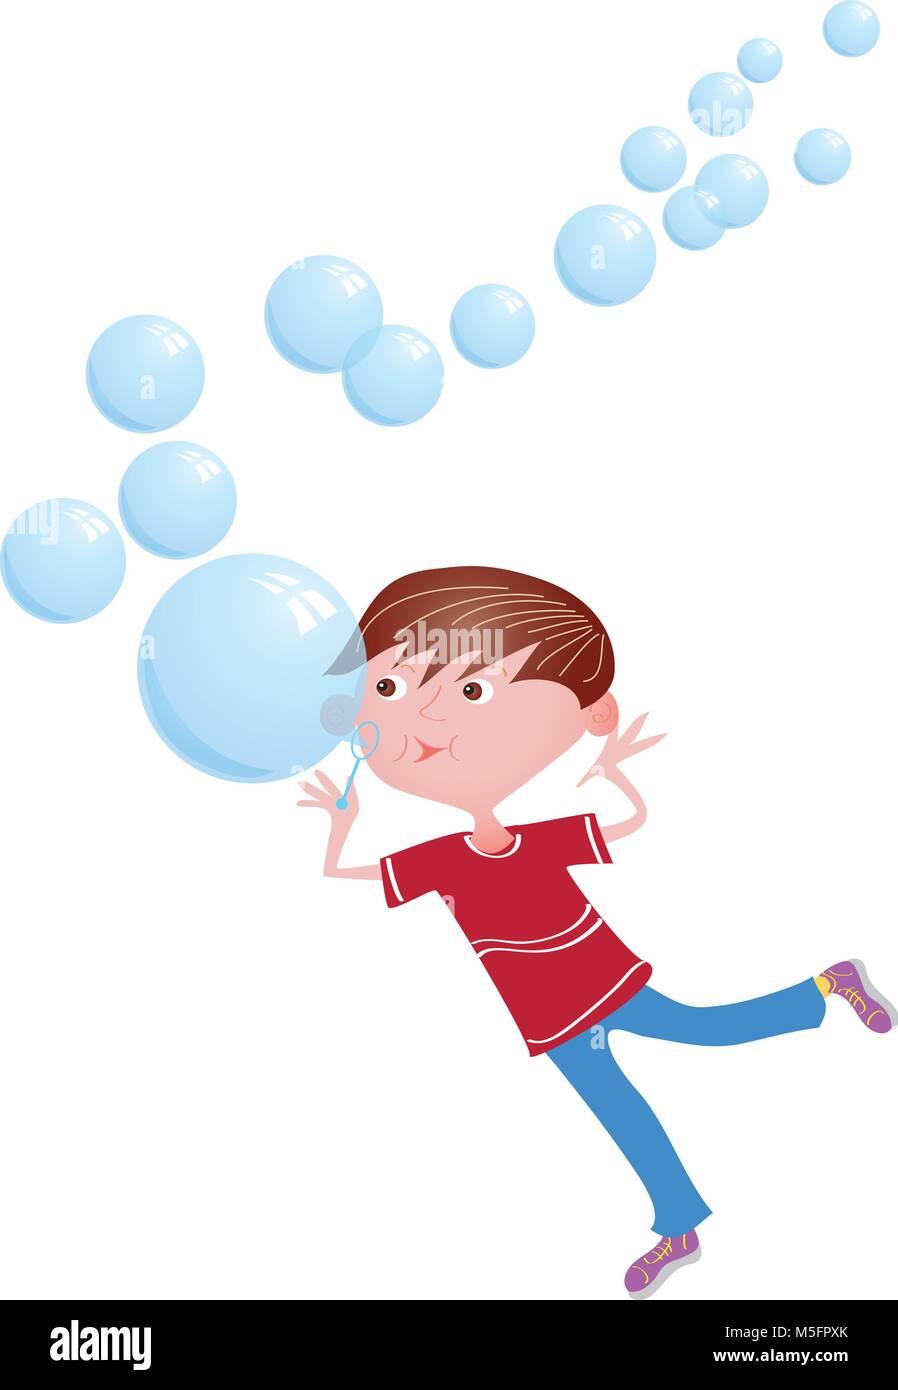 A cartoon boy blowing bubbles - Stock Vector